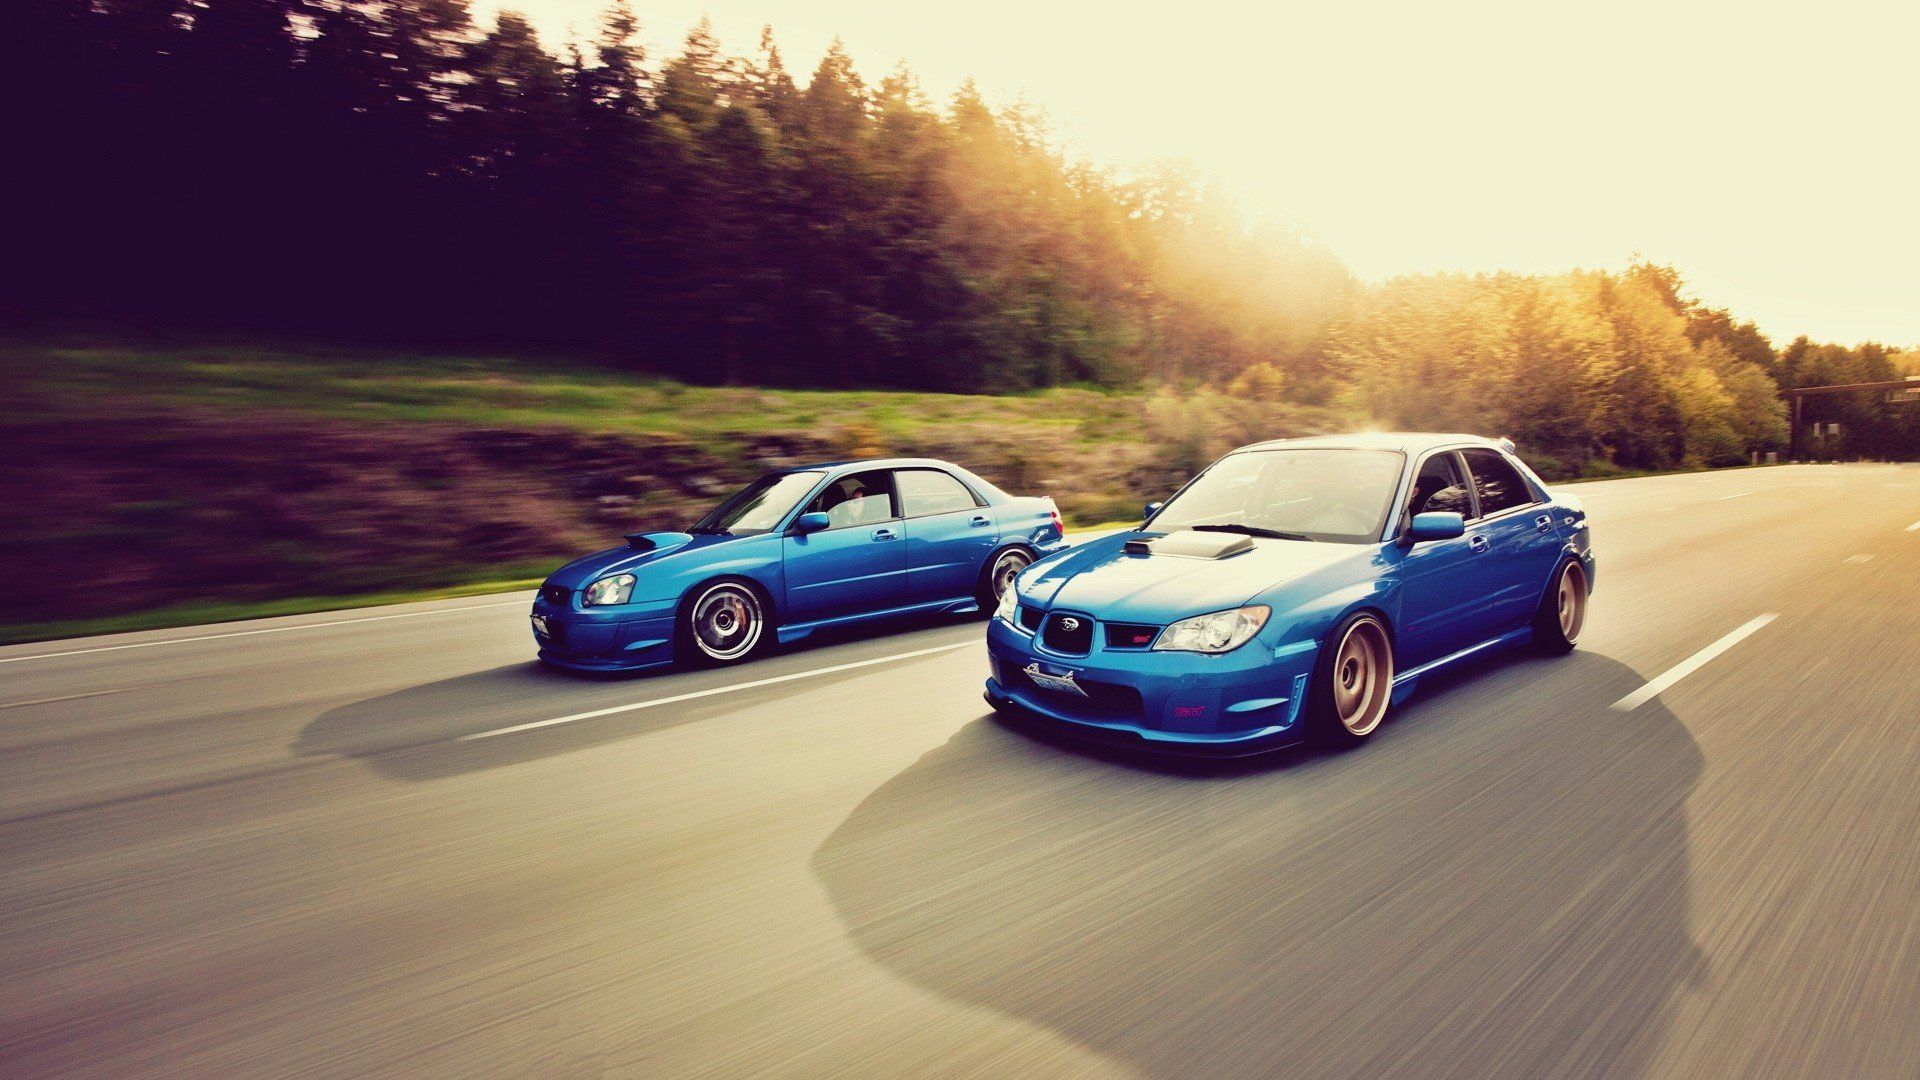 Subaru wrx jdm sti cars hd wallpaper - Cars Drifting Dust Jdm Japanese Domestic Market Races Roads Speed